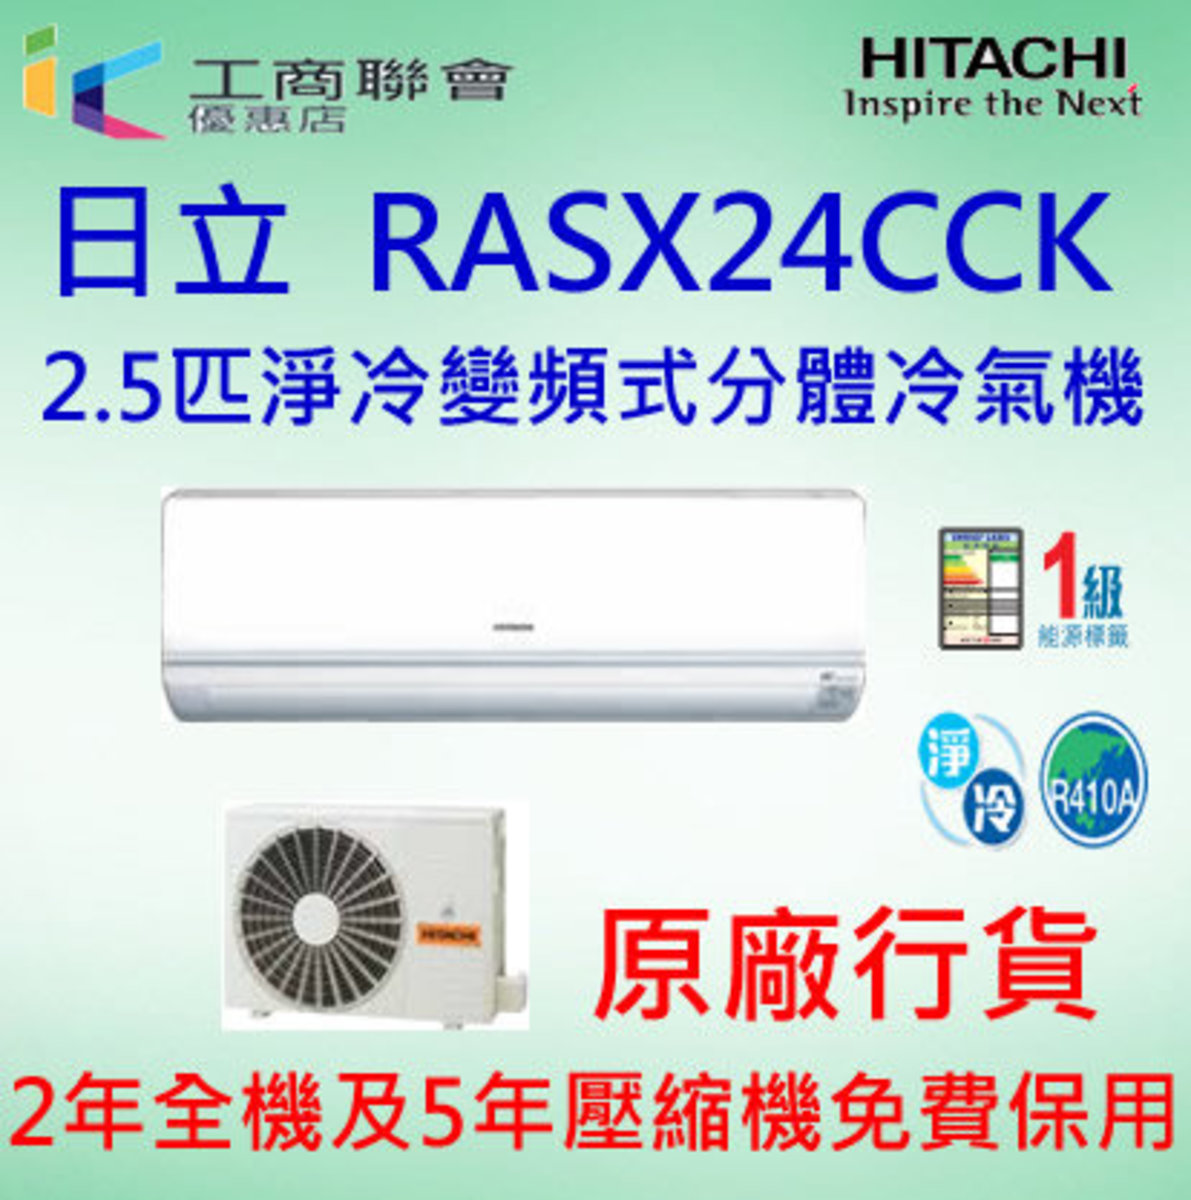 RASX24CCK  2.5匹 變頻淨冷分體式冷氣機